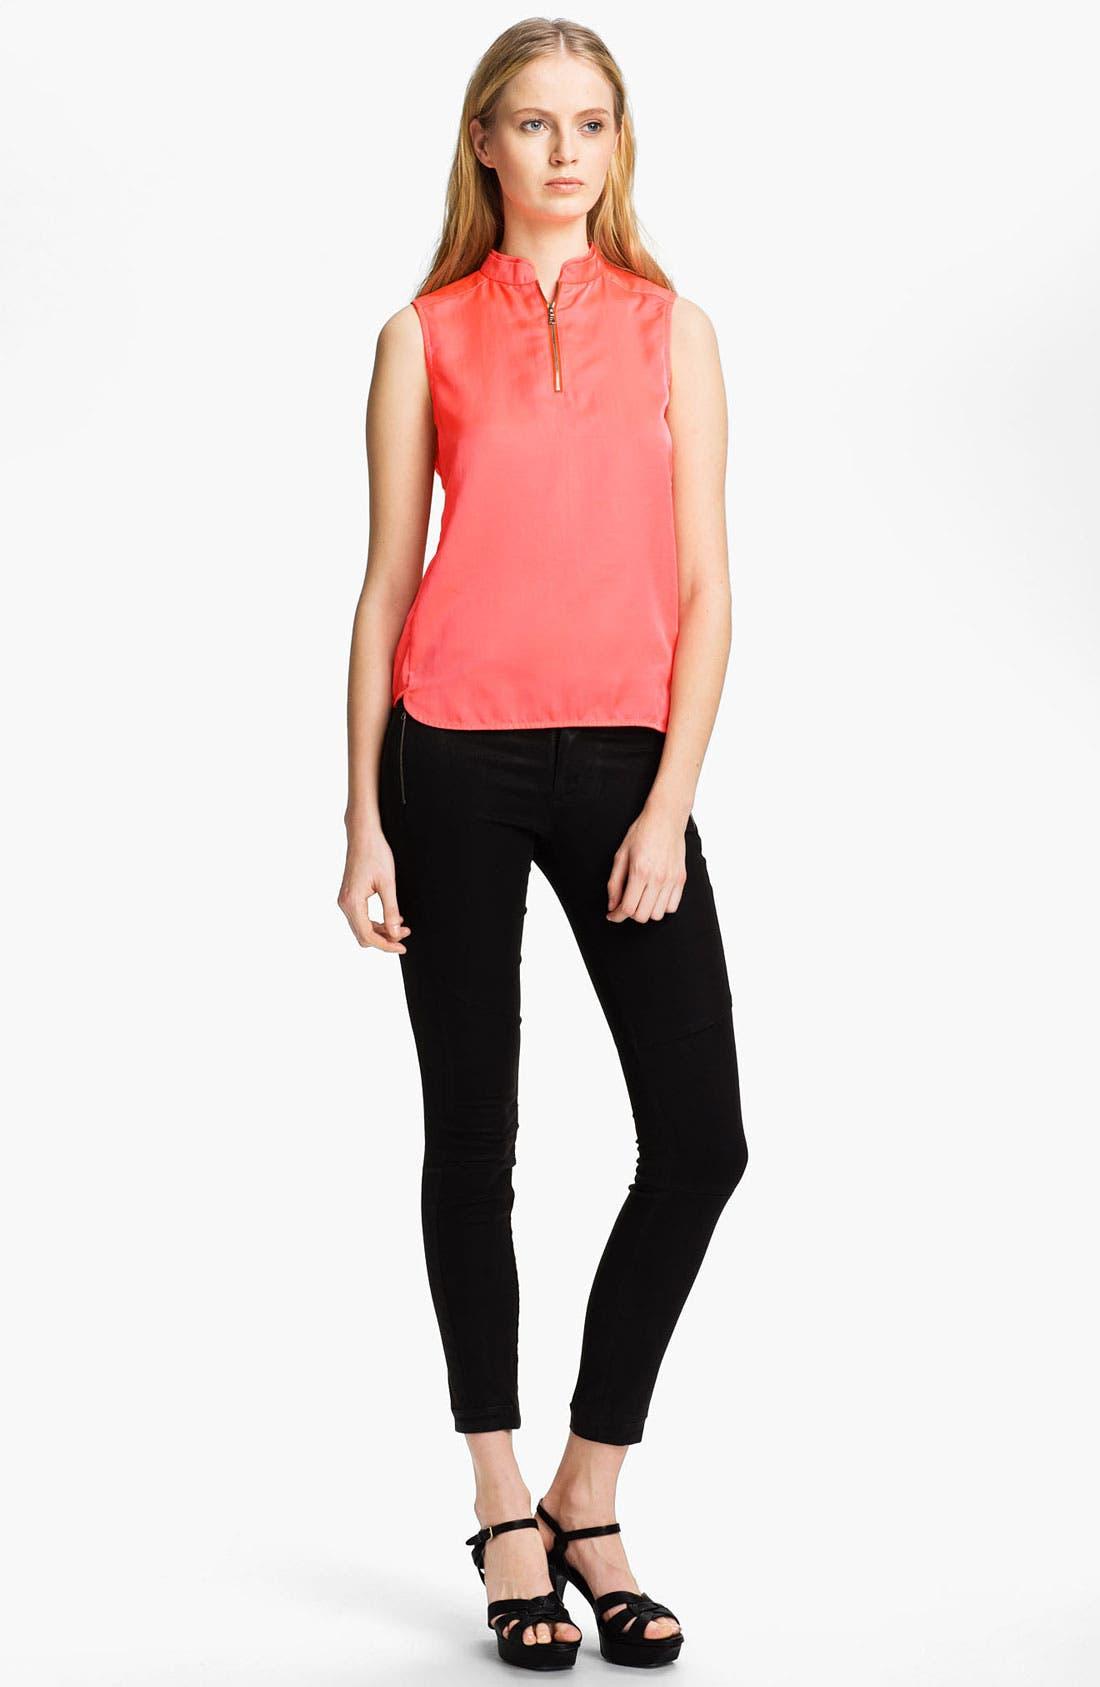 Alternate Image 1 Selected - J Brand Ready-to-Wear 'Katina' Mandarin Collar Top